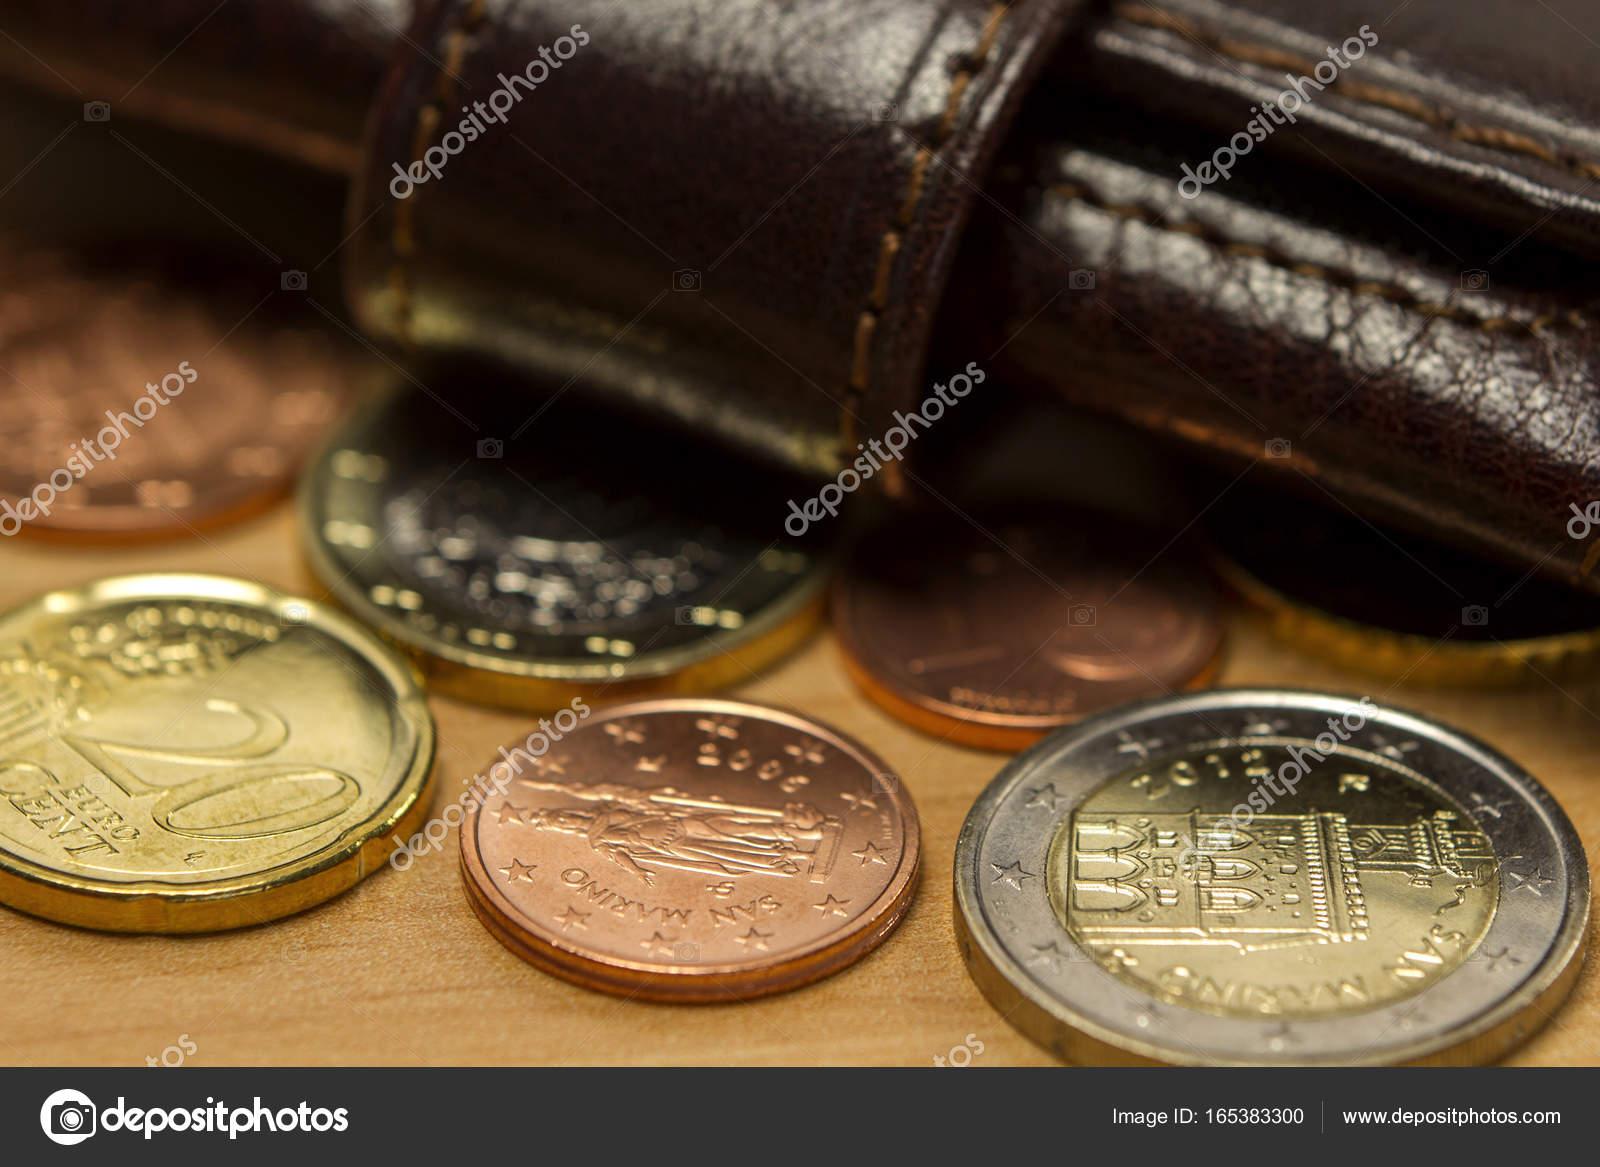 4abbb709d4 Καφέ ανδρικό πορτοφόλι και ευρώ νομίσματα στο ξύλινο τραπέζι ...